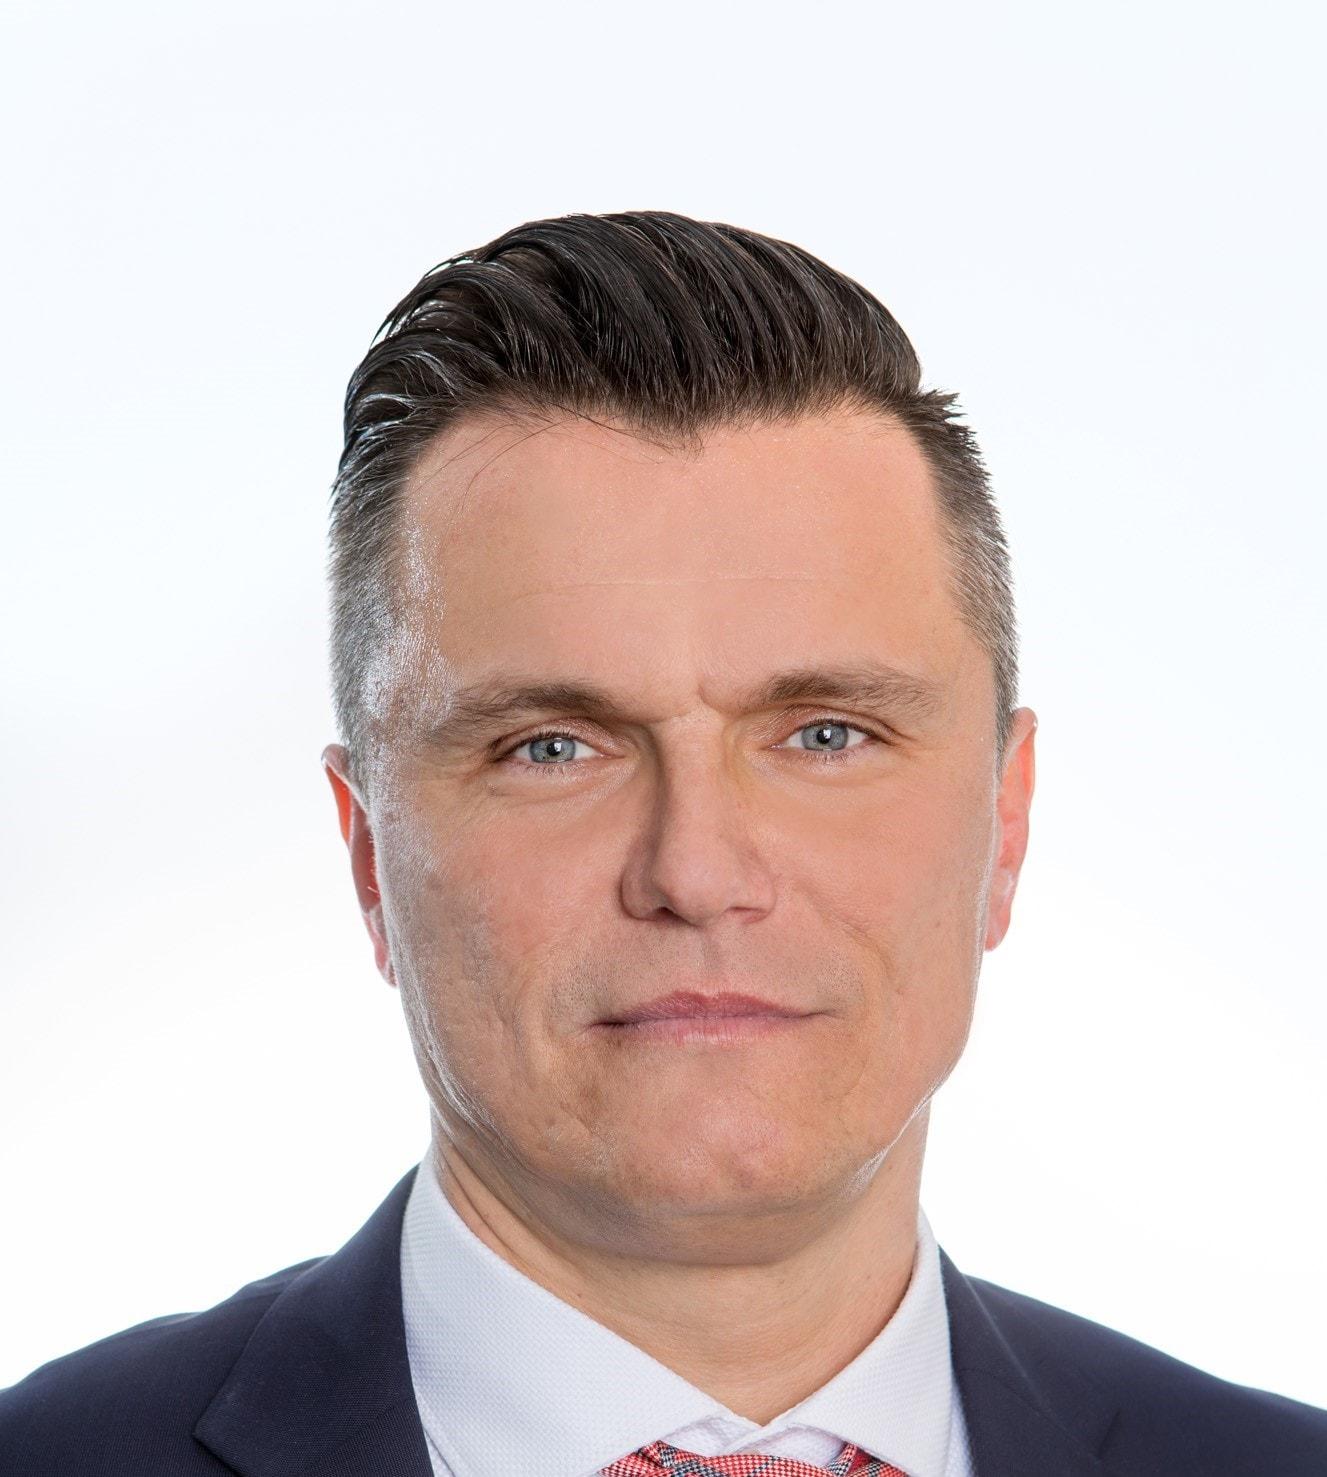 Peter Piroch